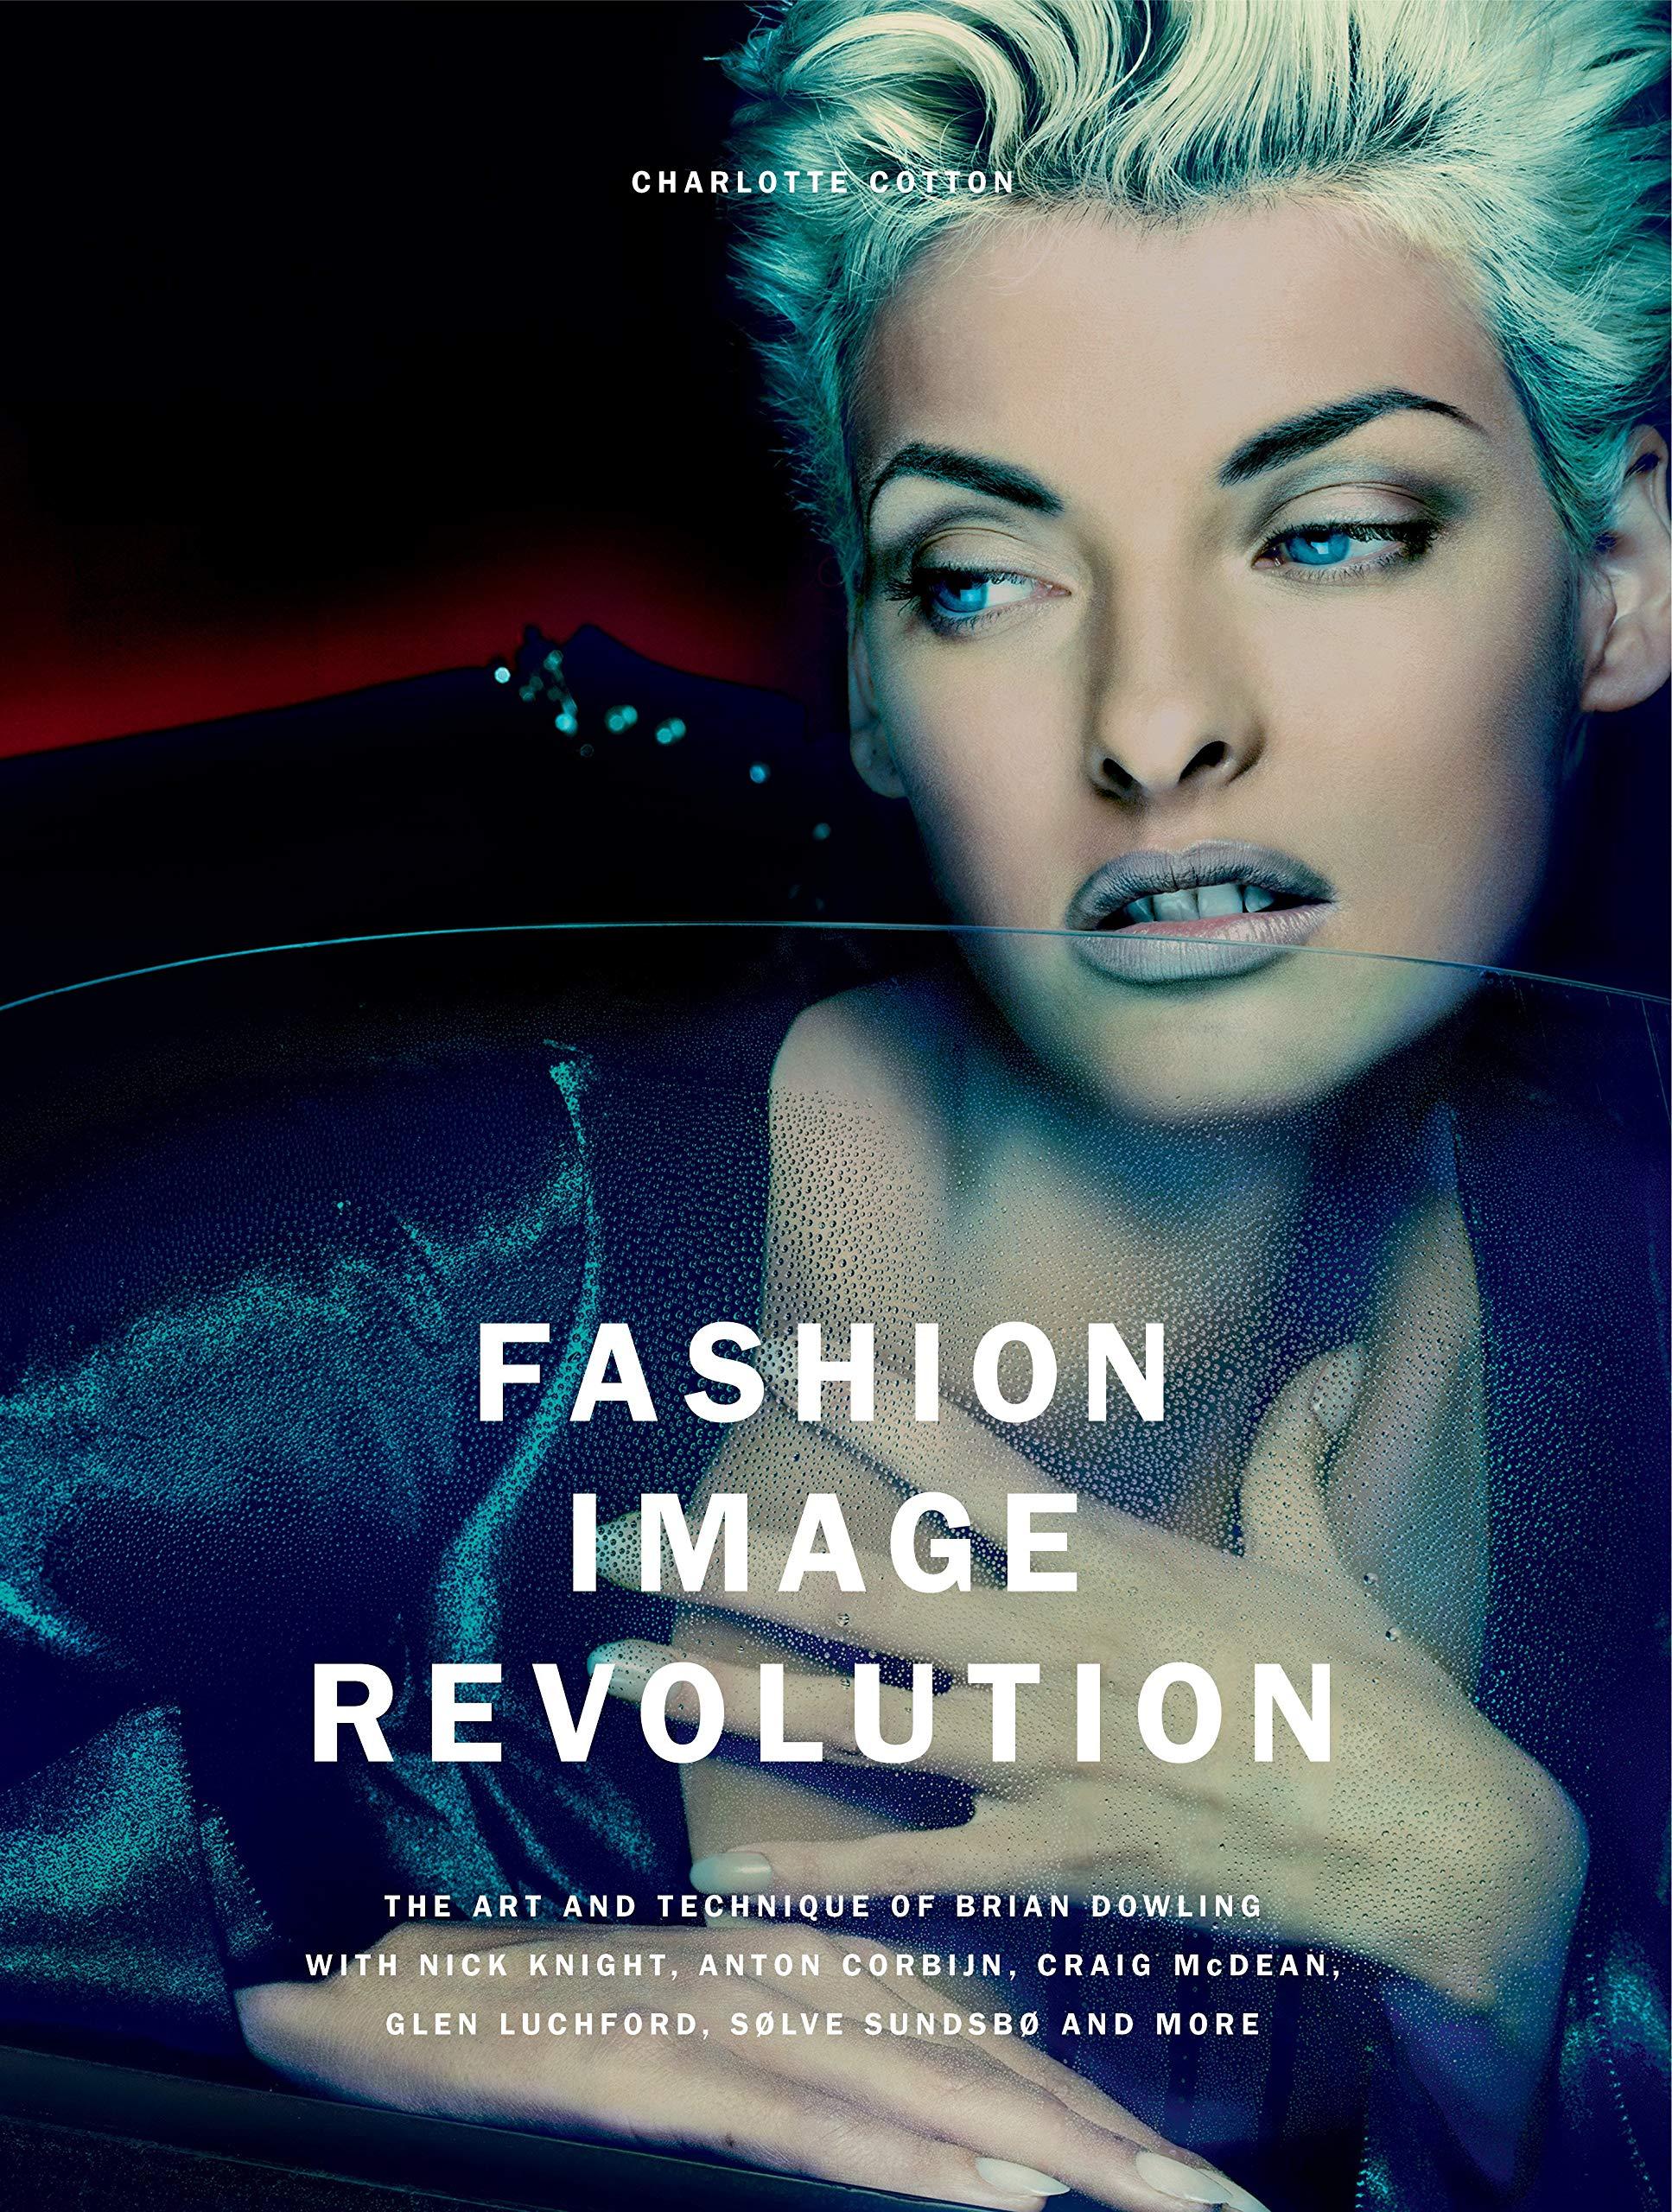 Fashion Image Revolution by Prestel